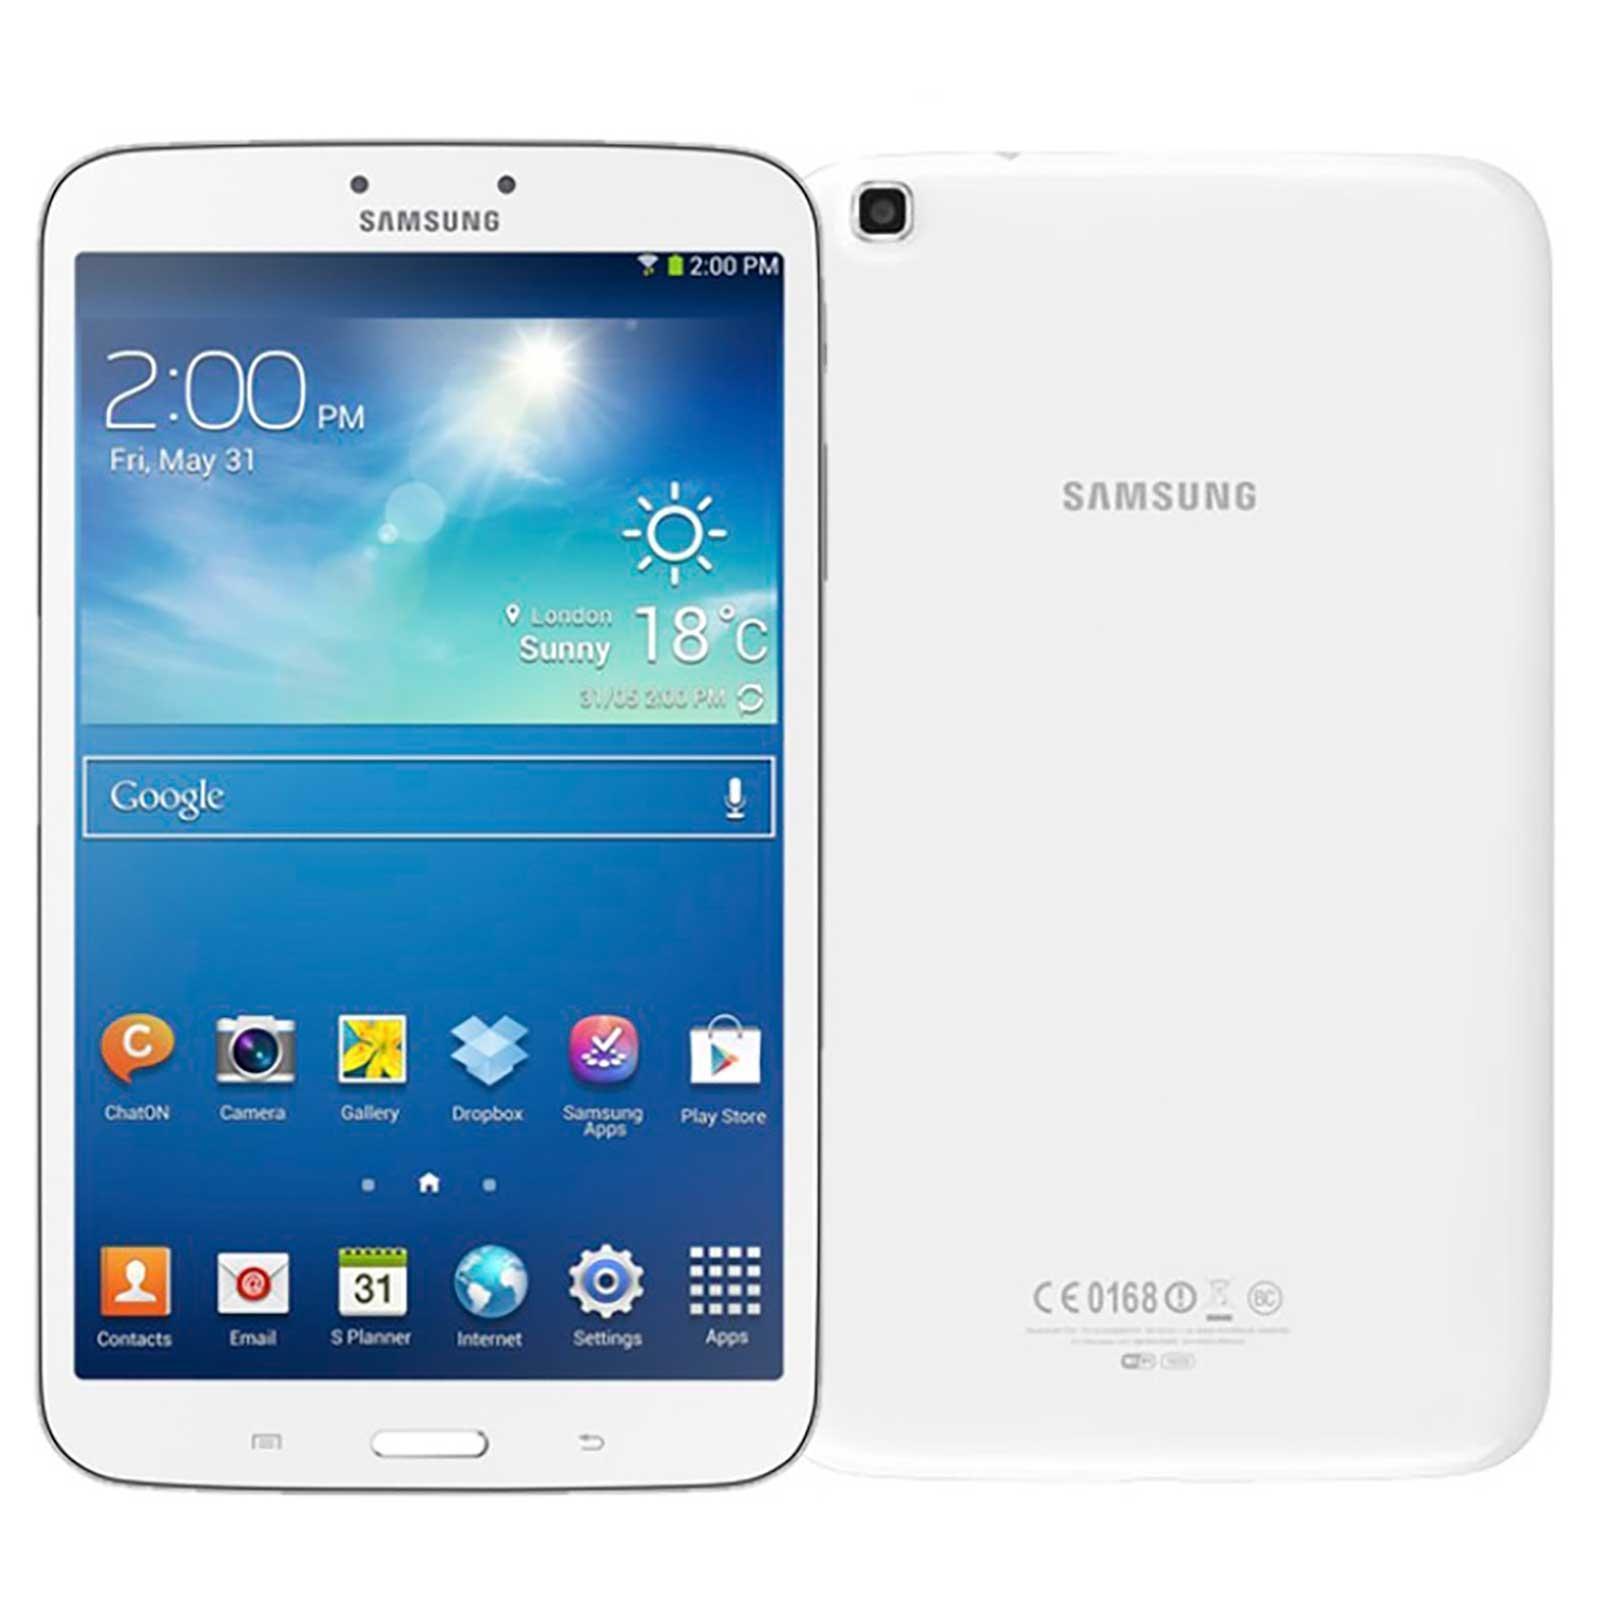 Galaxy Tab 3 (2013) - WiFi